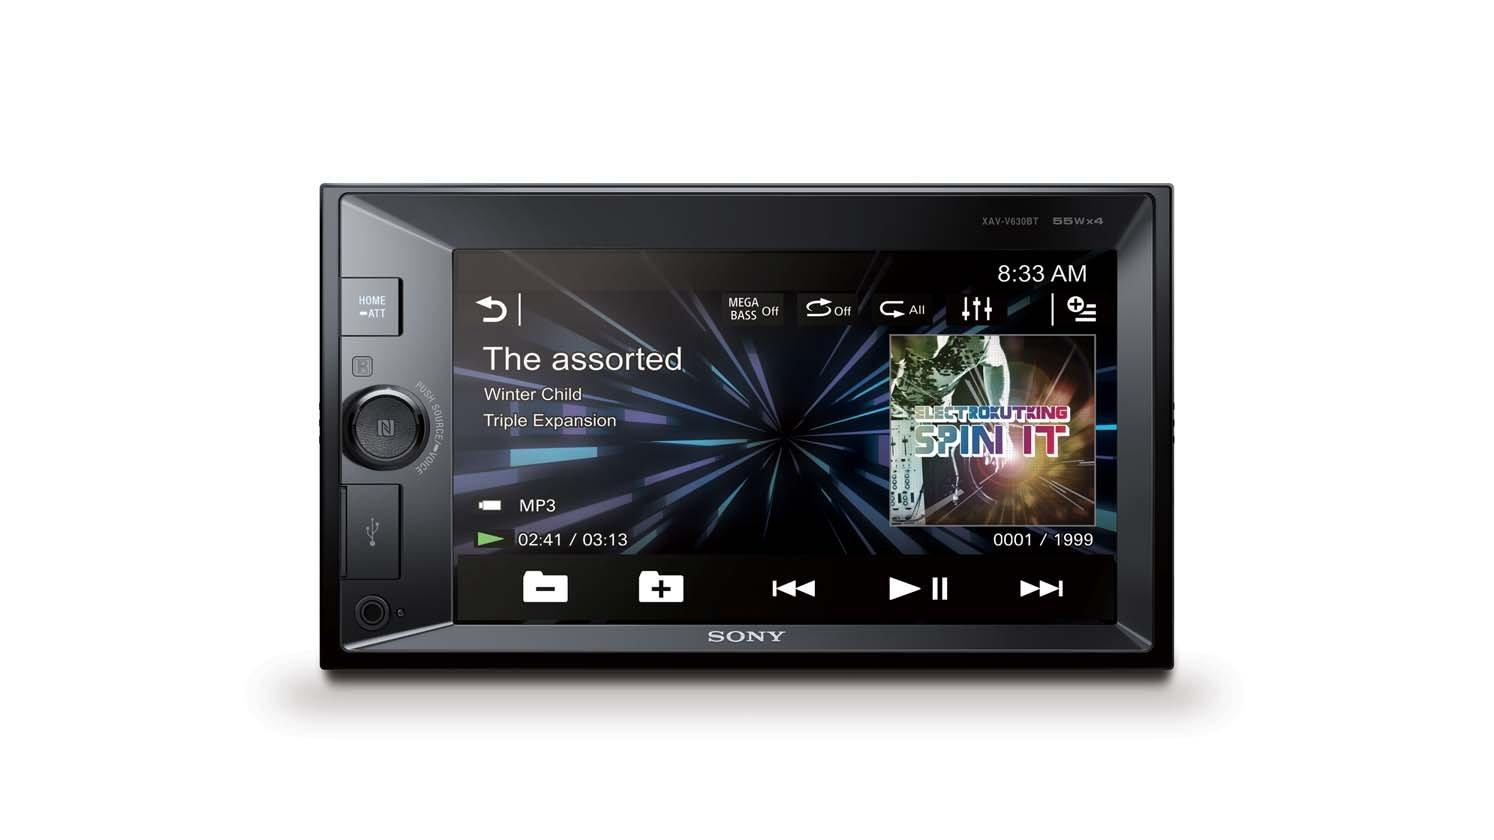 Sony XAV-V630BT Receptor Digital Multimedia Doble DIN NFC Bluetooth: Amazon.es: Electrónica